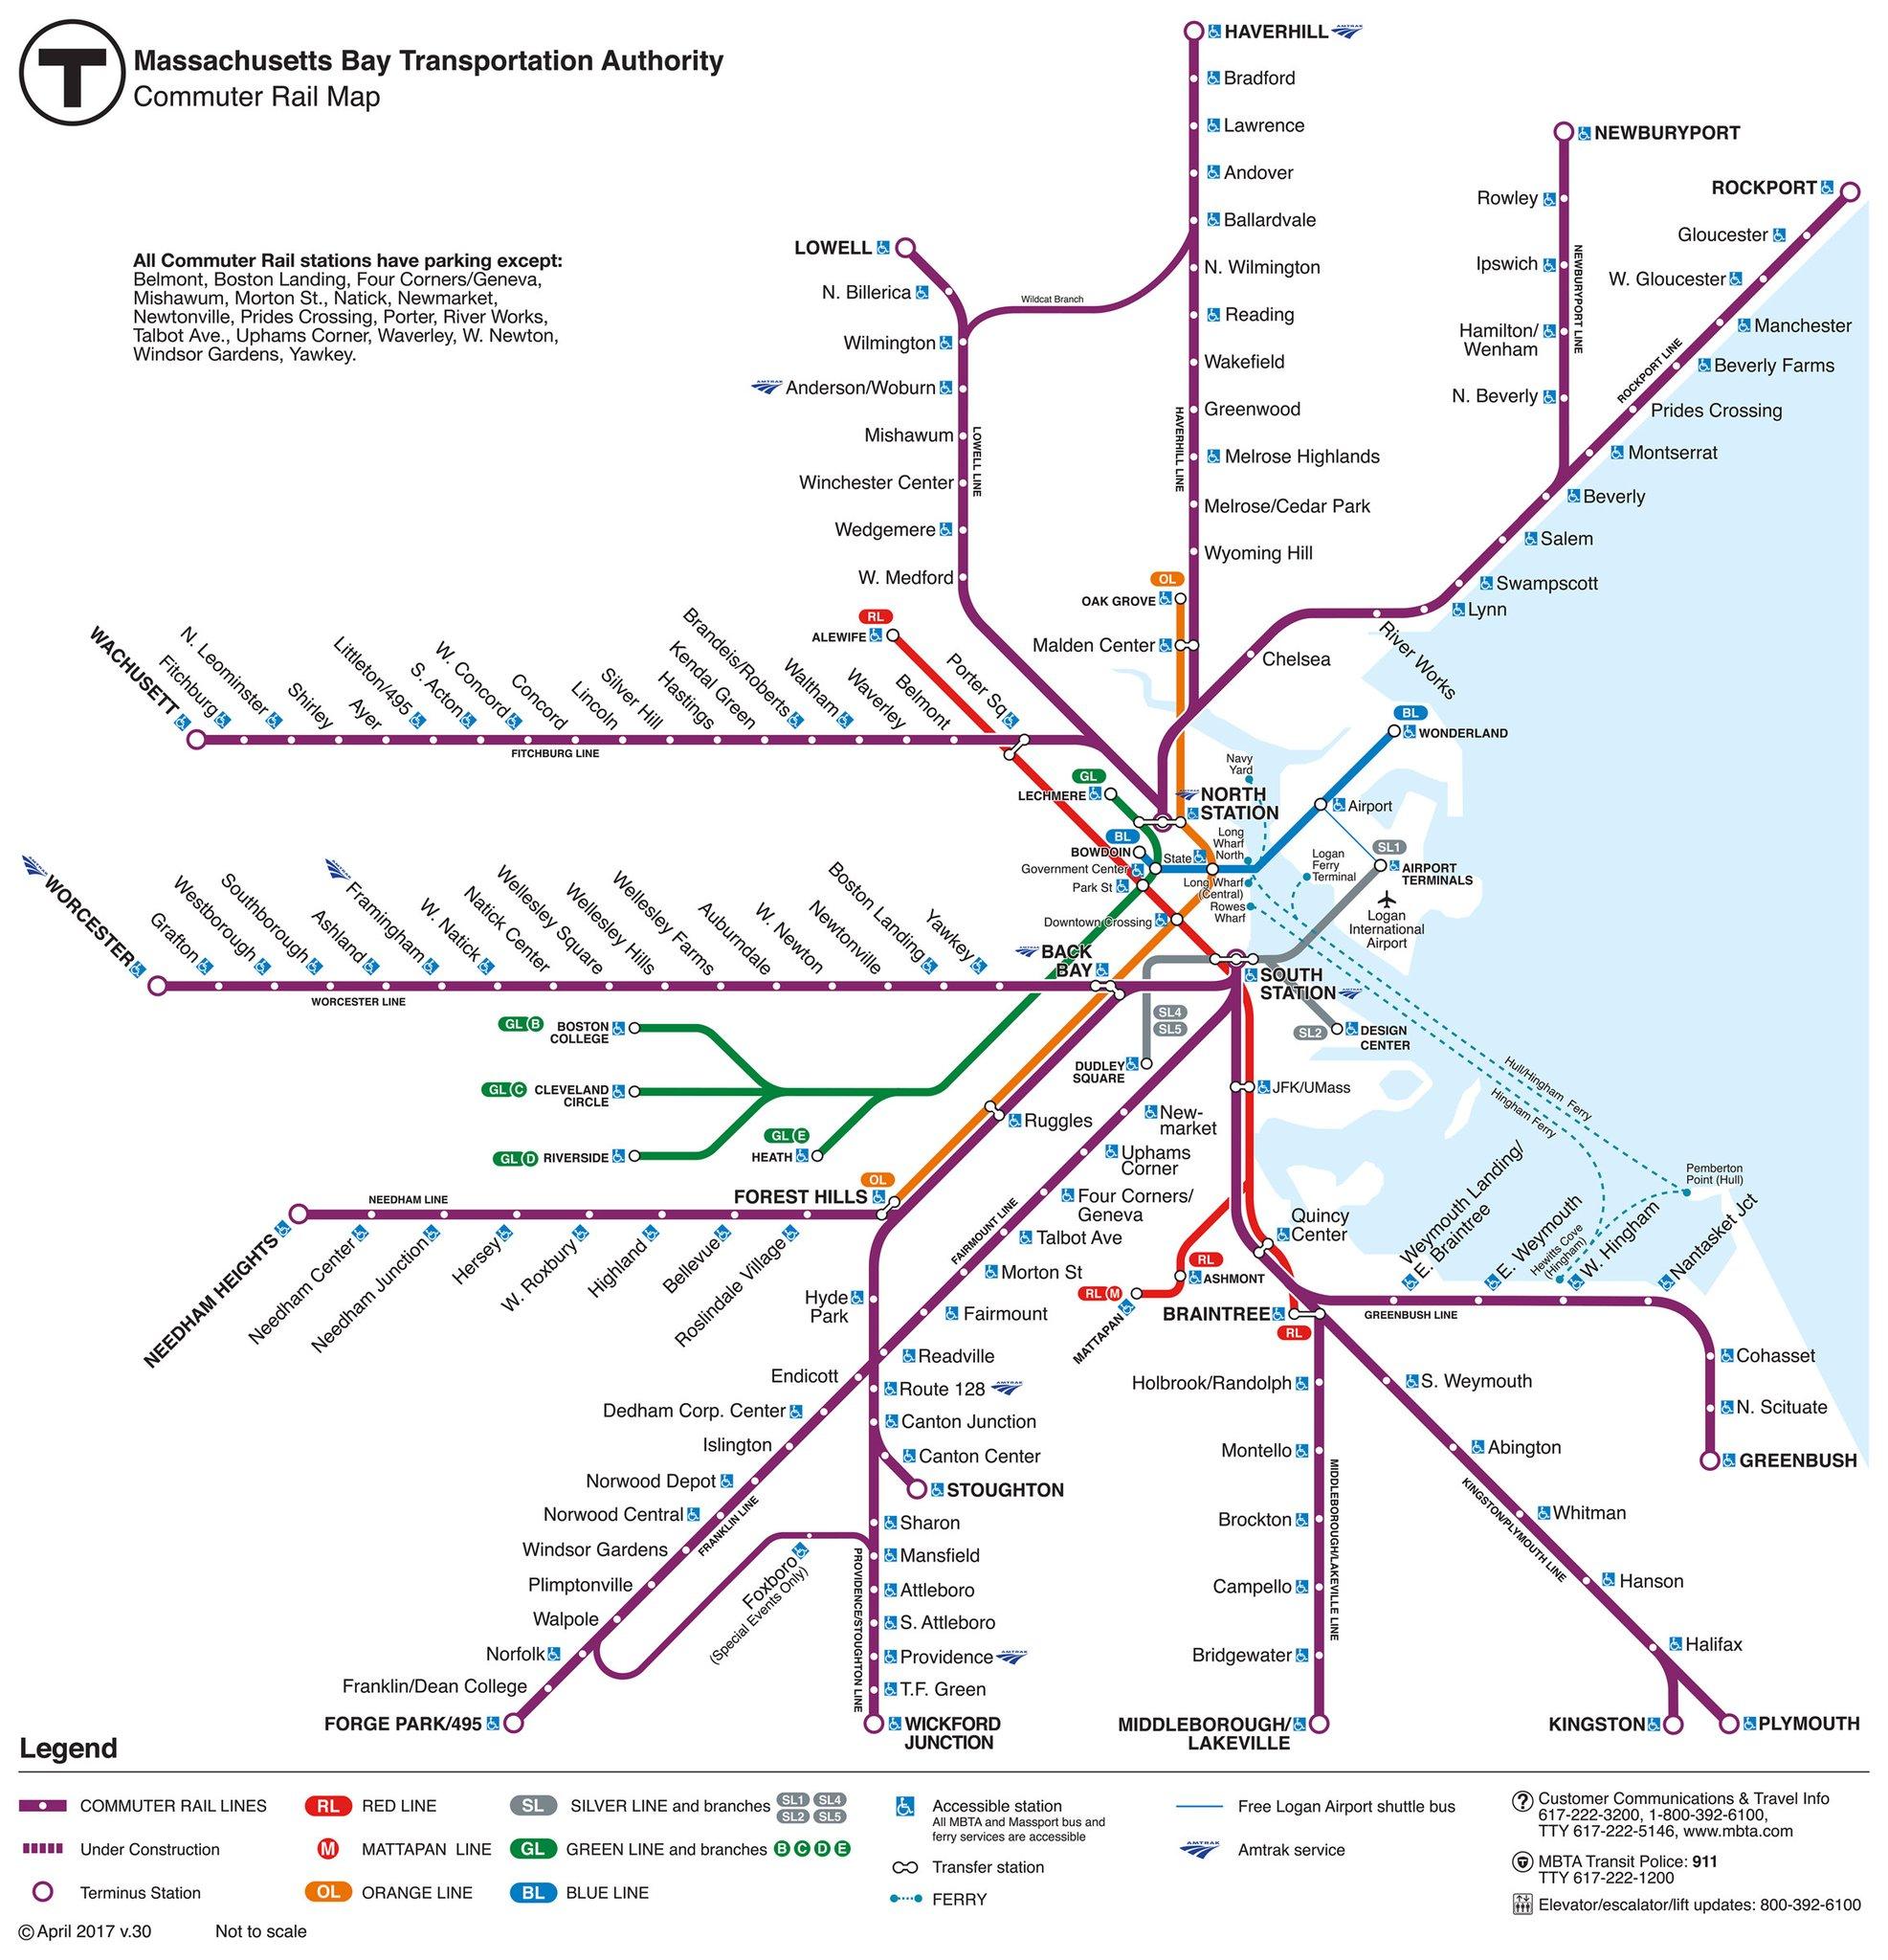 boston train station map Train South Station boston train station map